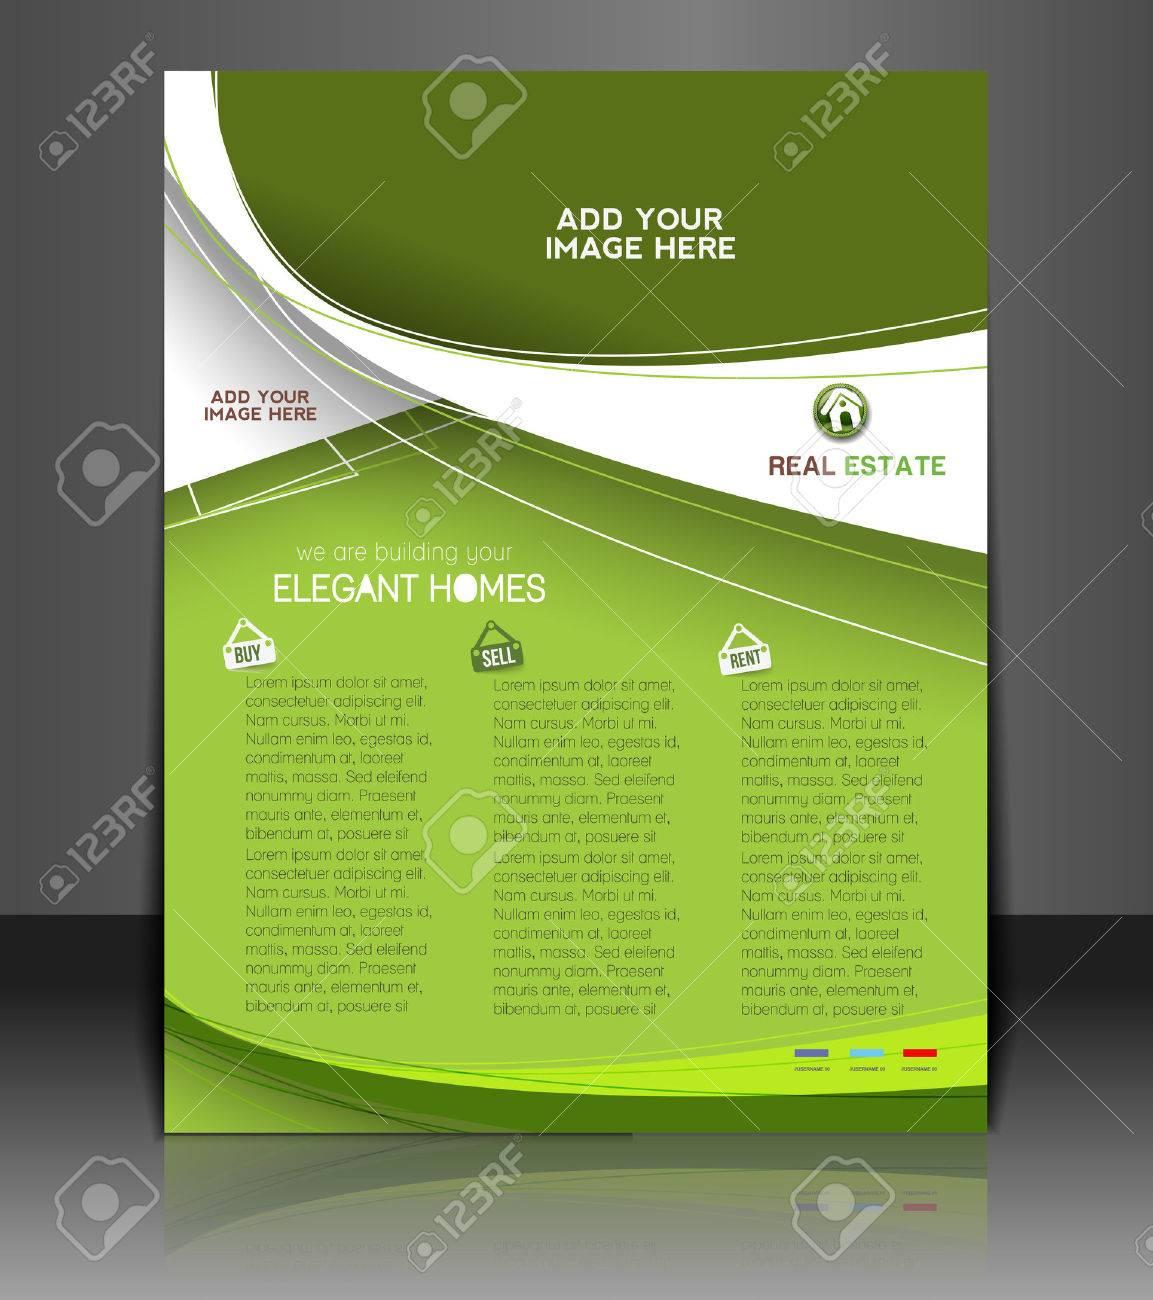 Real Estate Agent Flyer & Poster Template Design